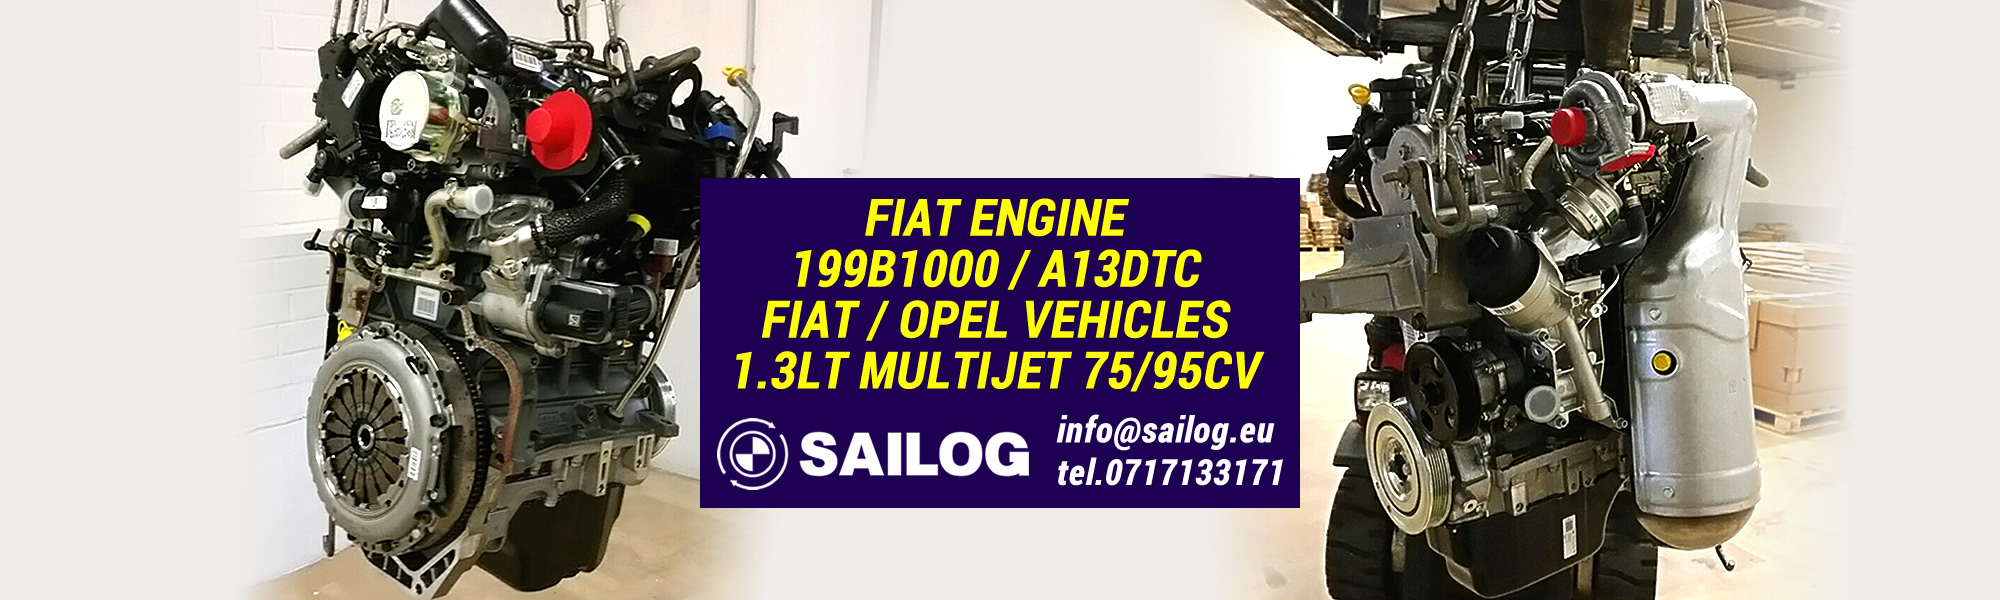 Fiat Engine 199B1000 / A13DTC | SAITO